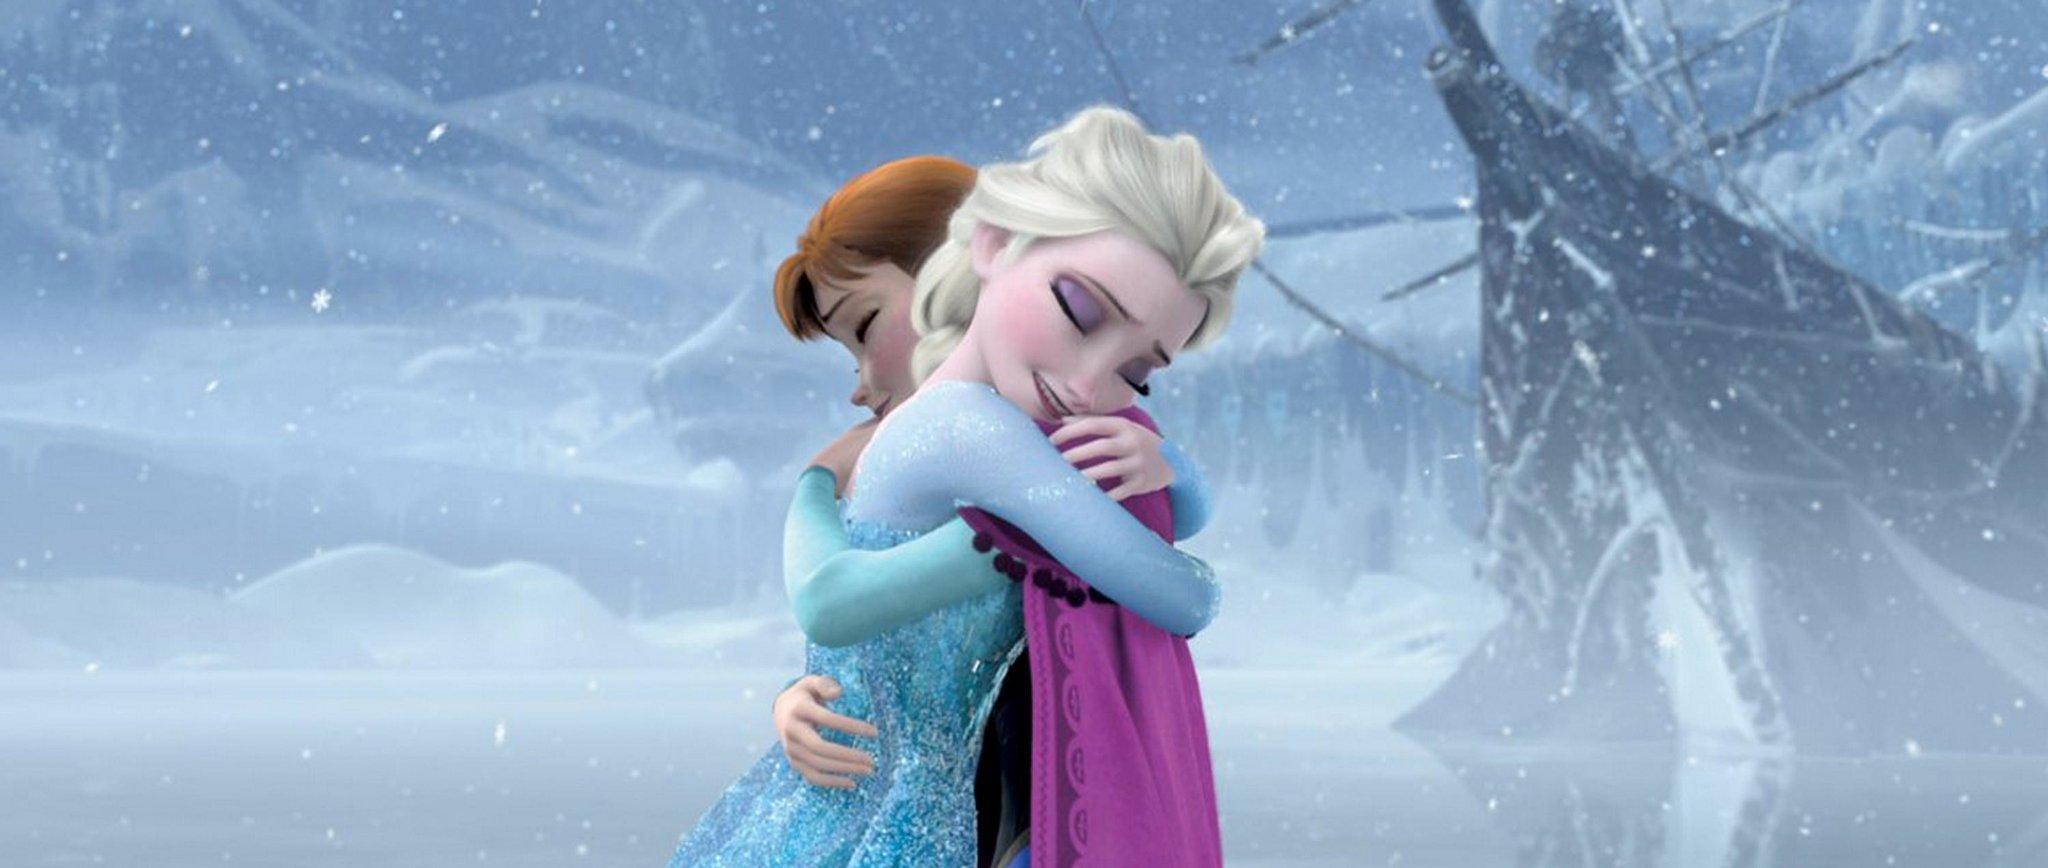 The original ending for 'Frozen' is so, so bad: https://t.co/8Q6gSt86QF https://t.co/5F8mNIxusR